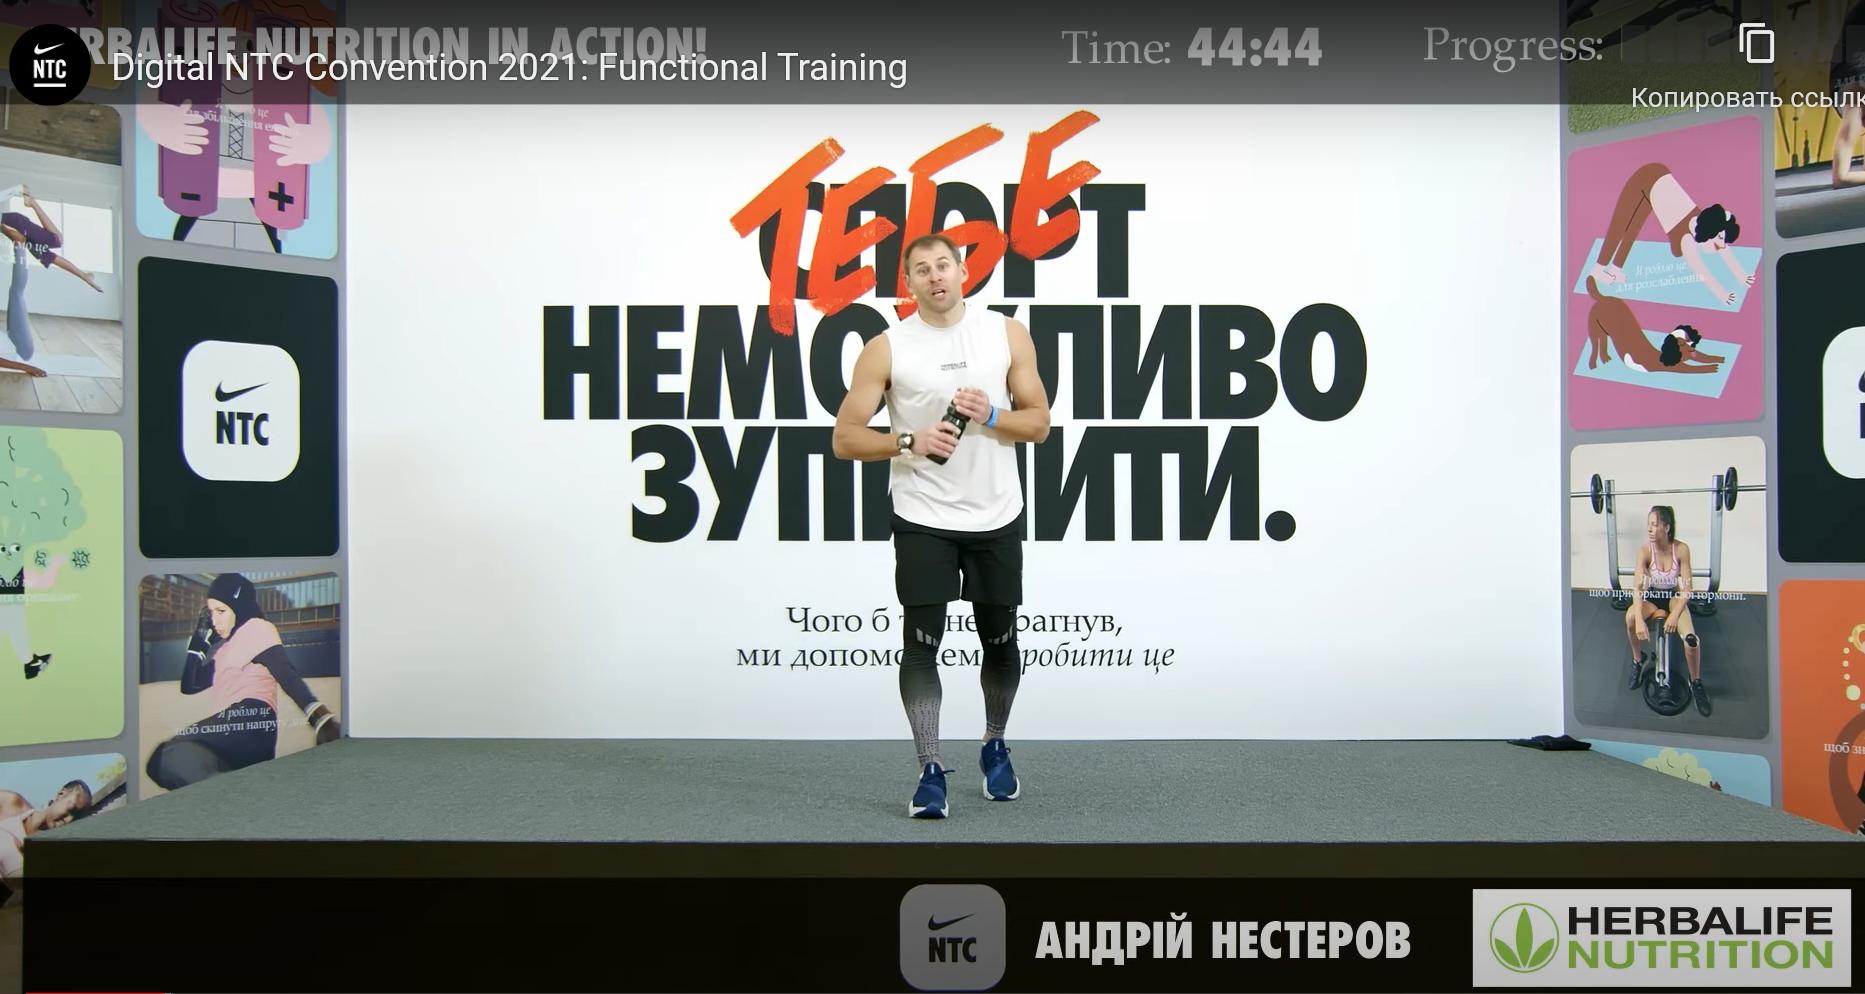 Професійний фітнес-тренер, експерт Herbalife Nutrition Андрій Нестеров